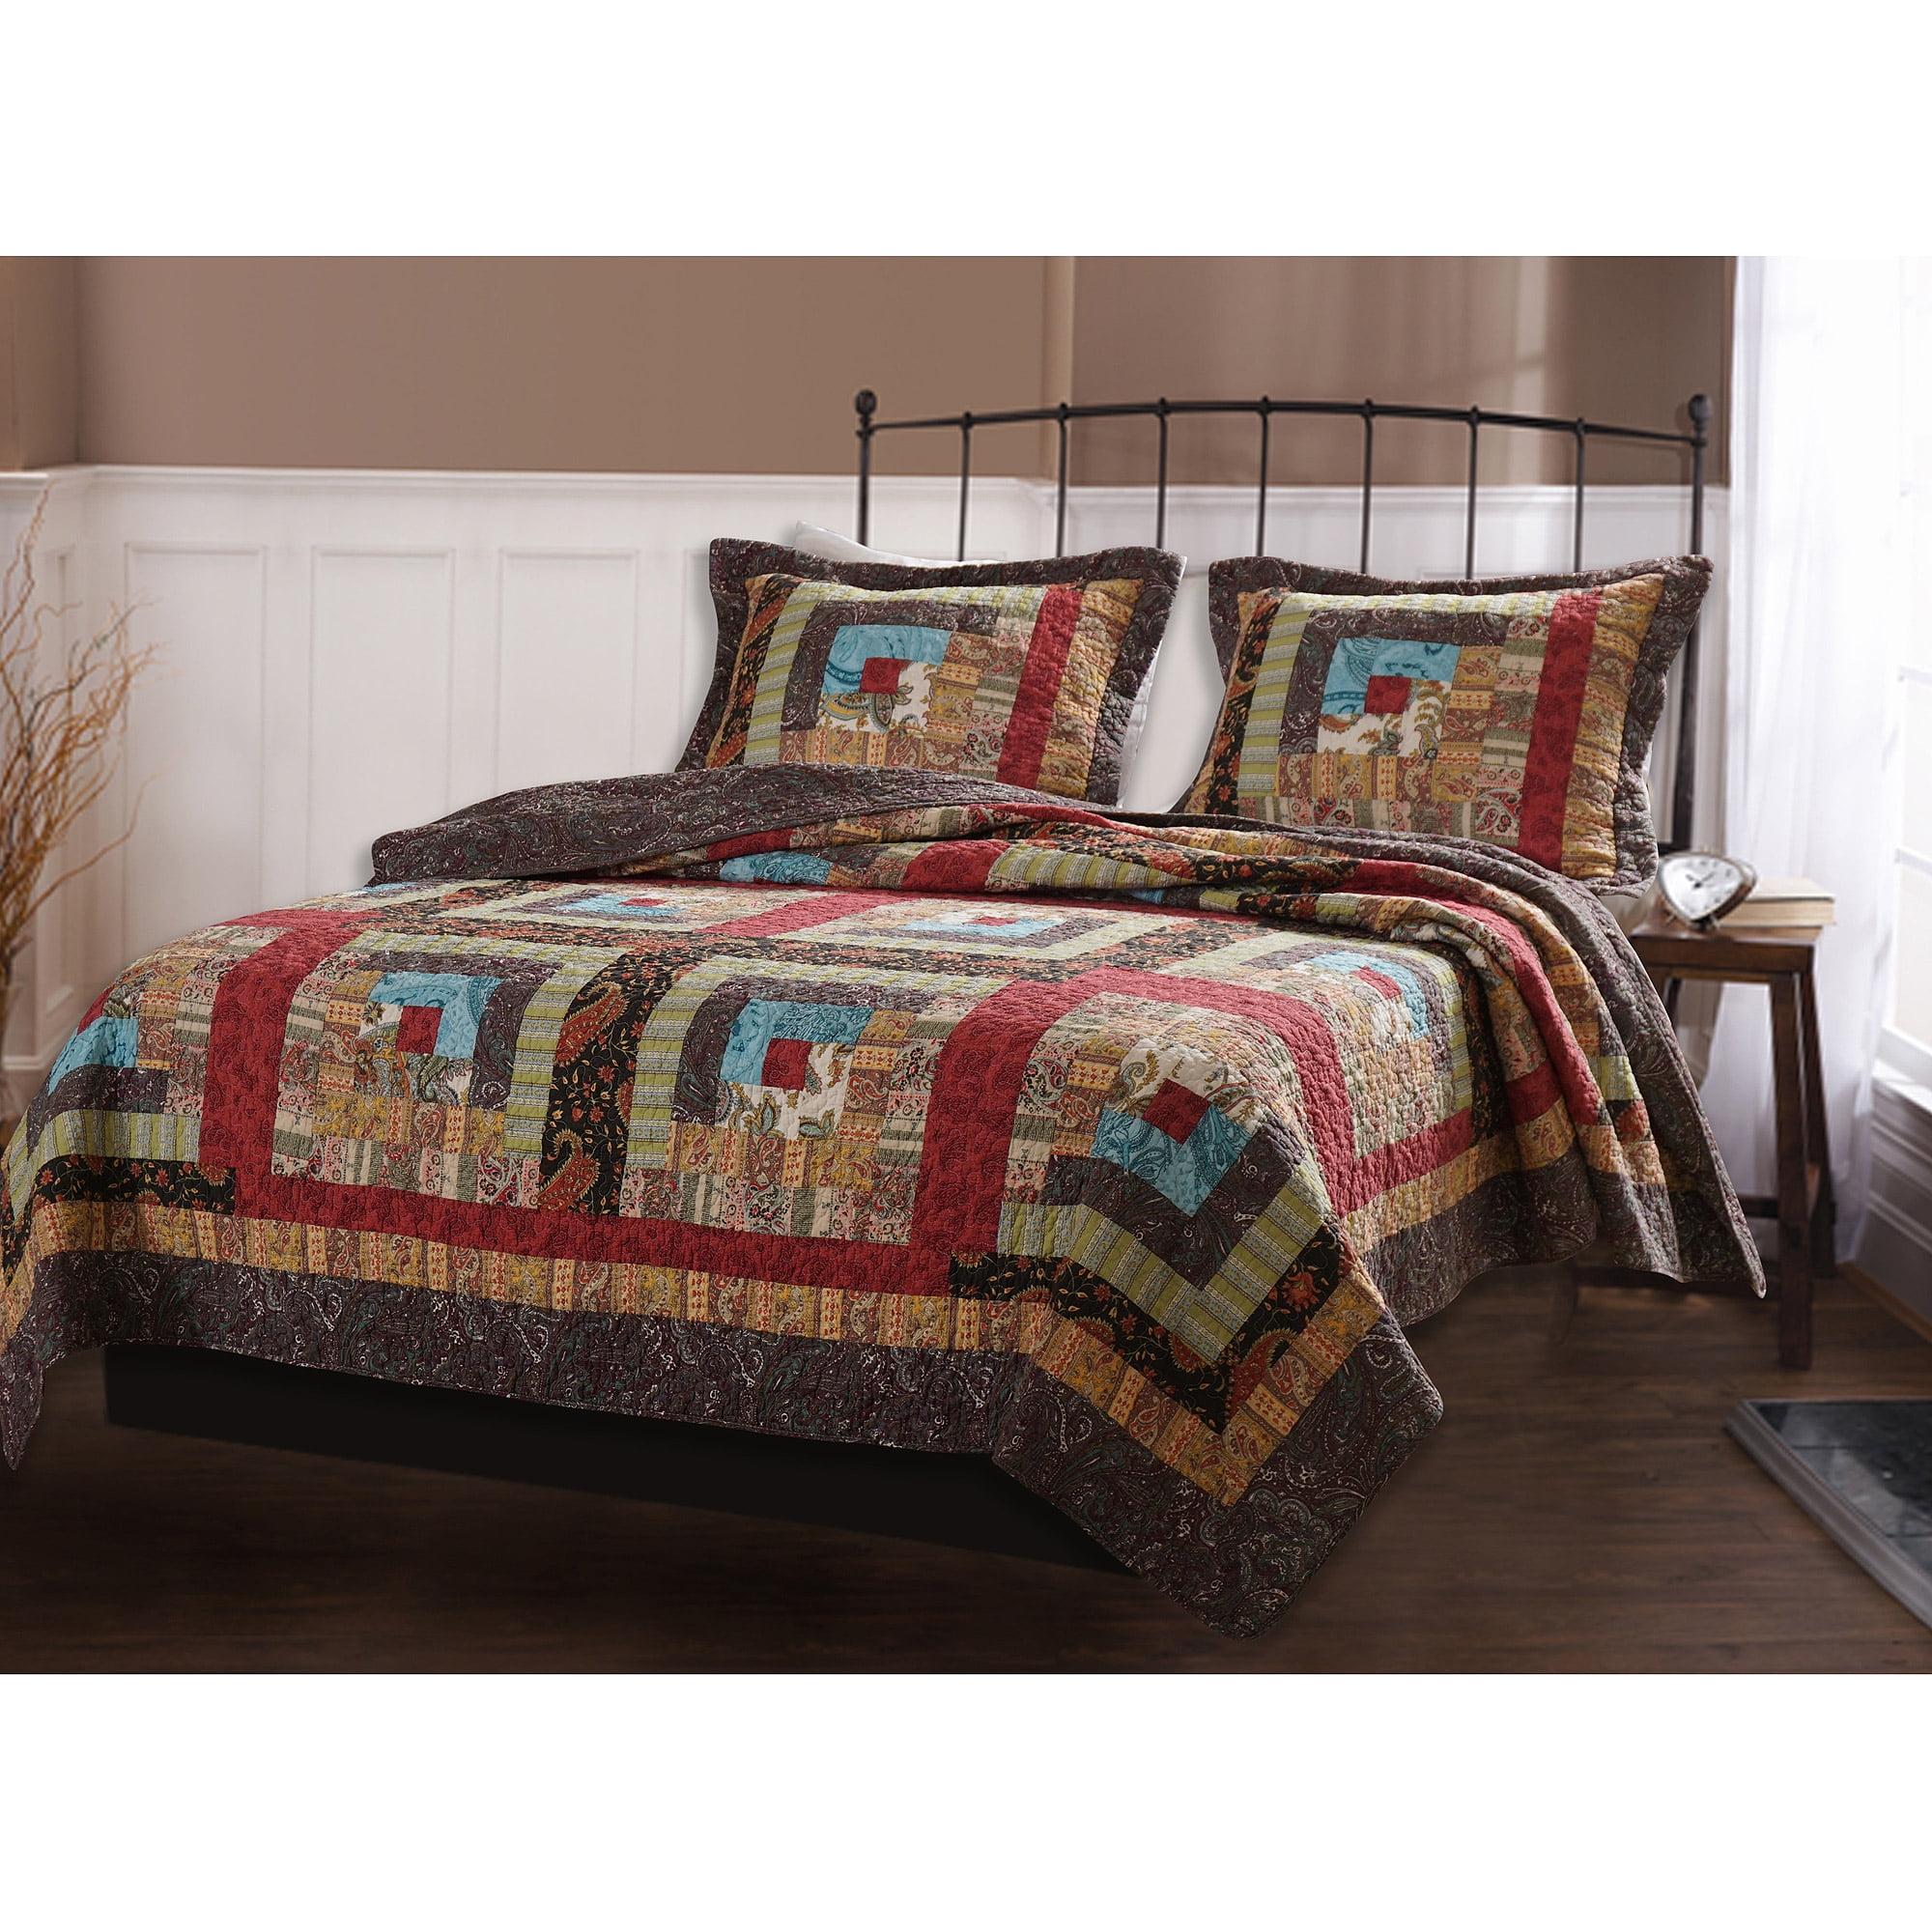 Global Trends Calistoga Quilt Bedding Set Walmart Com